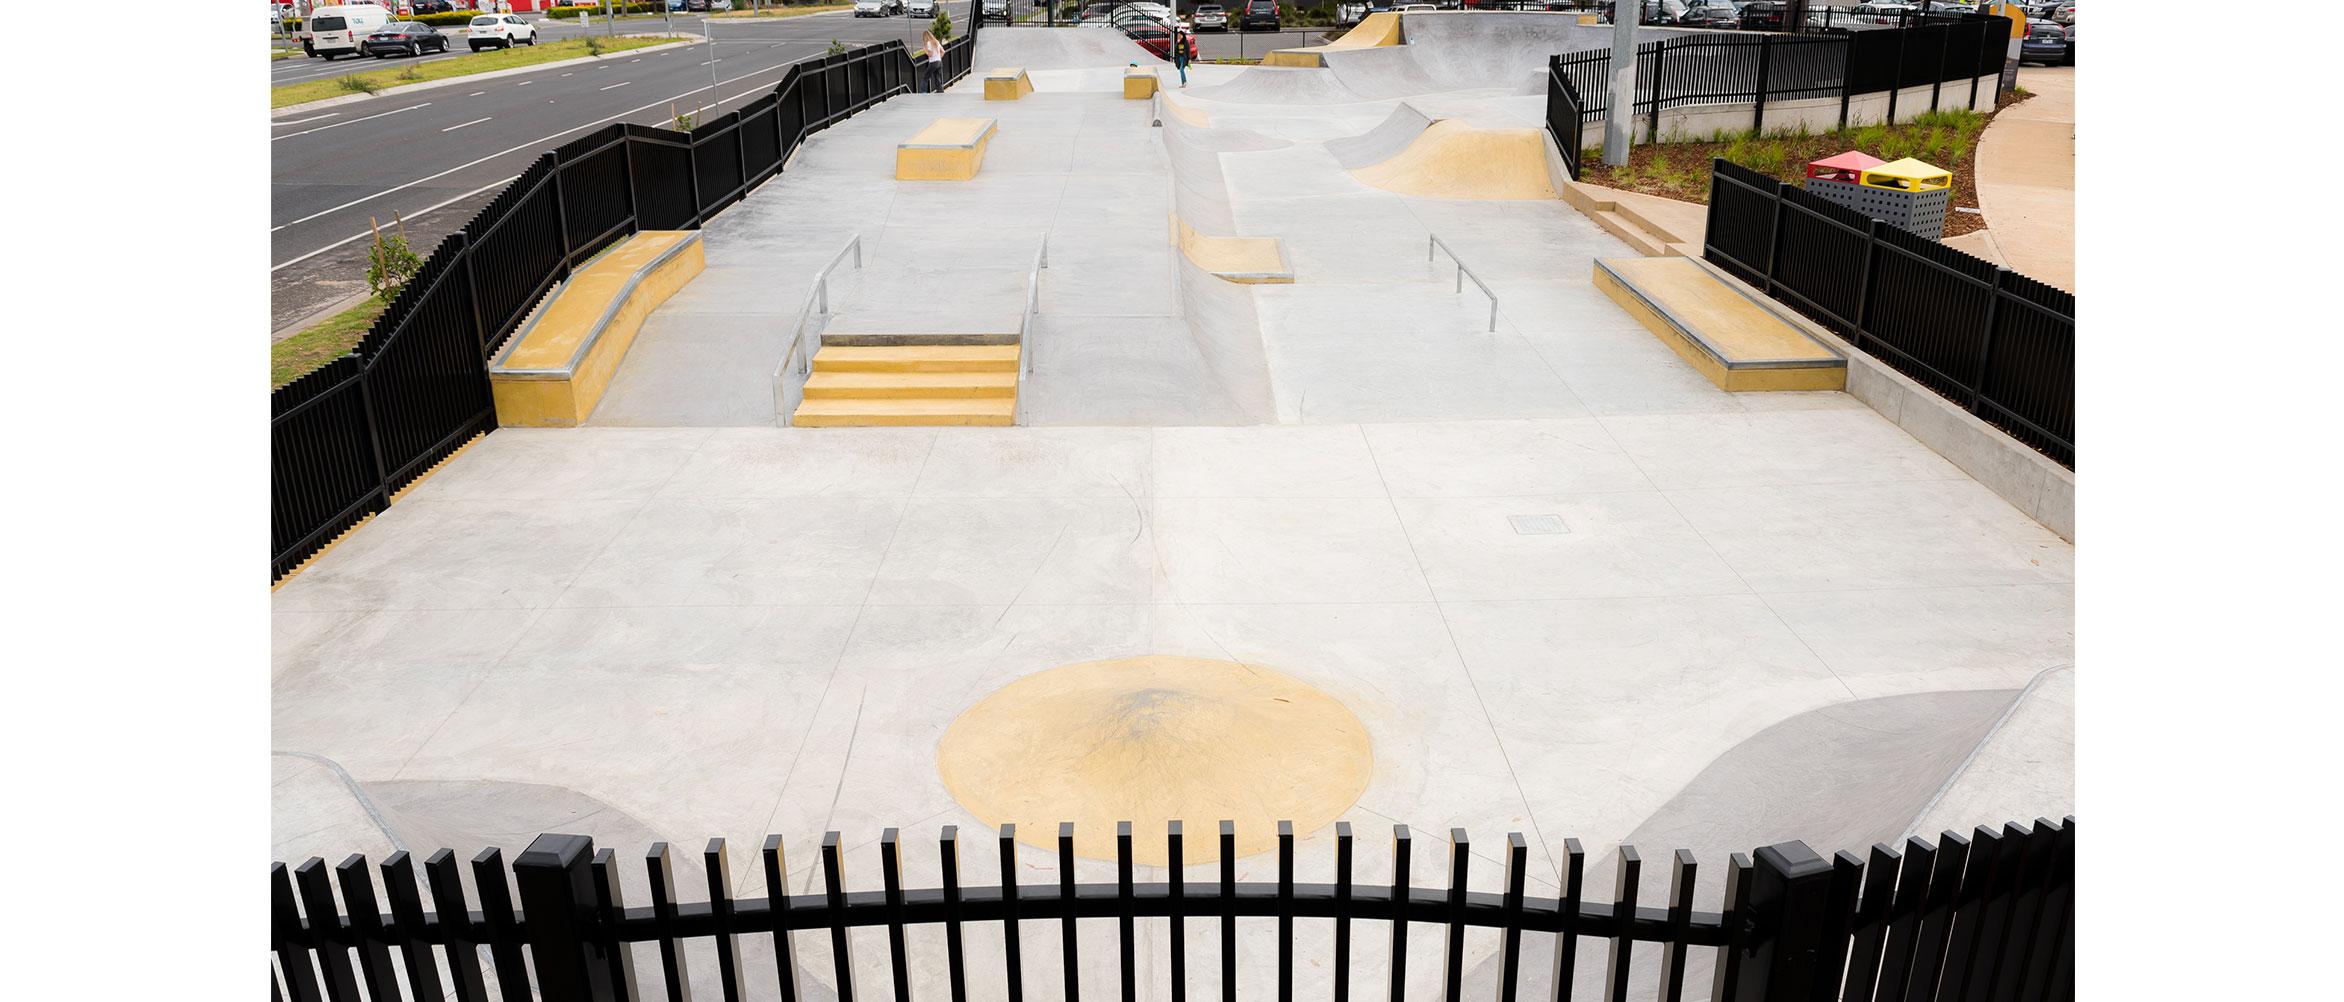 Bentleigh East street section